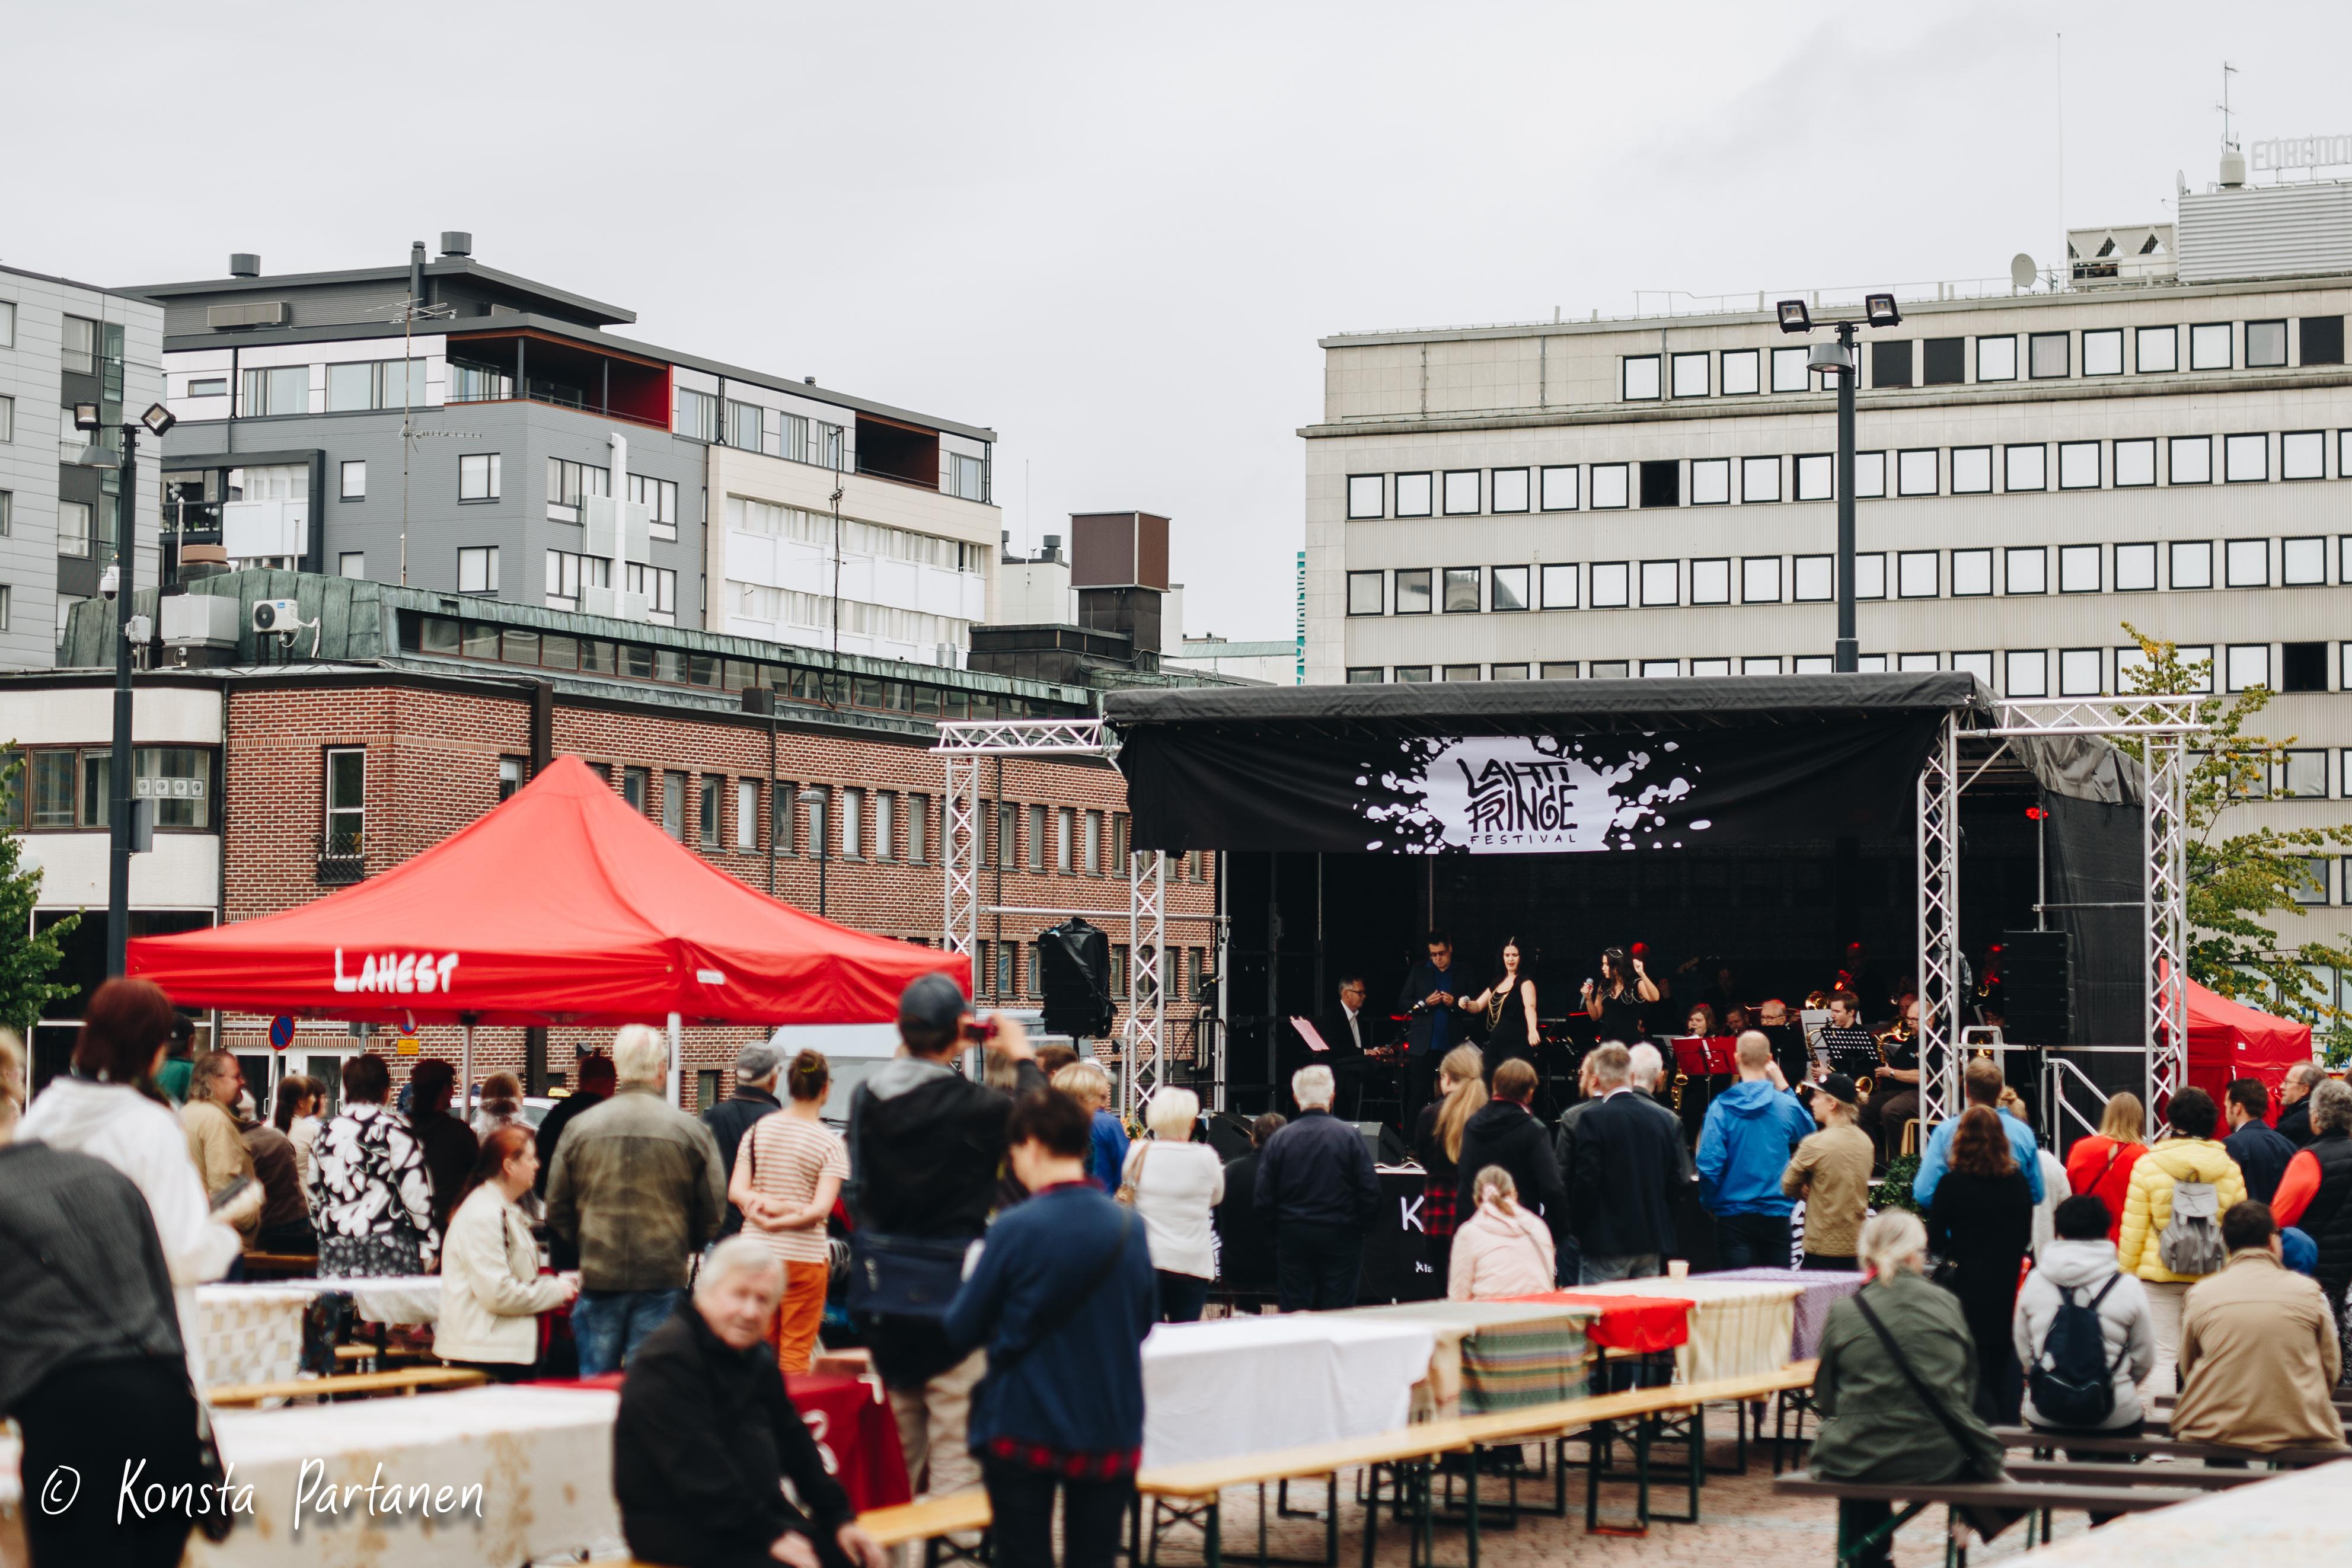 The 2018 Lahti Fringe Festival. ©Lahti University of Applied Sciences/Konsta Partanen (2018)